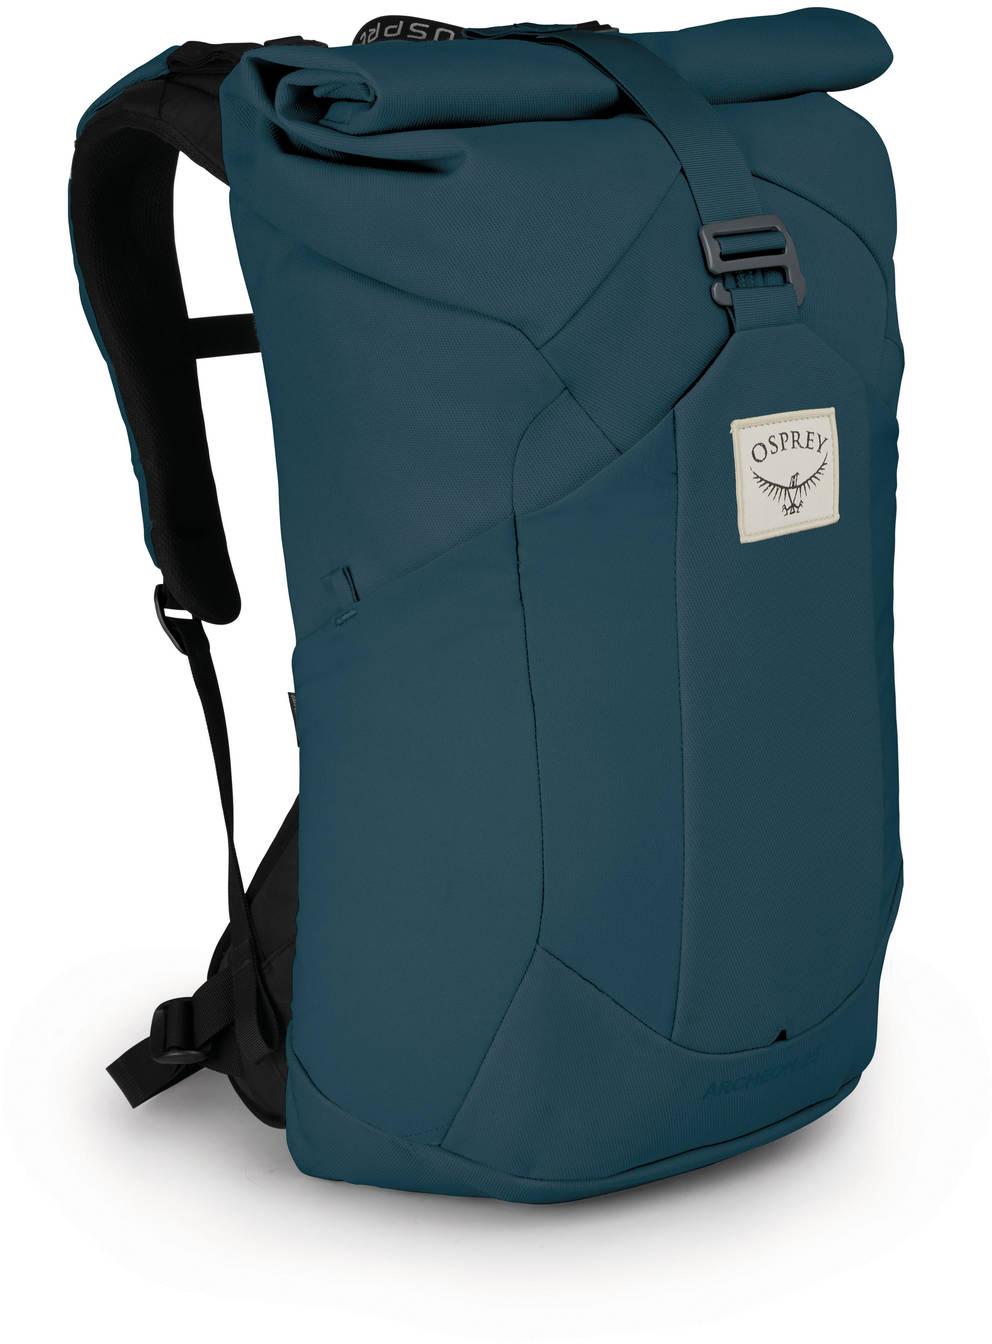 Городские рюкзаки Рюкзак Osprey Archeon 25 M's Stargazer Blue Archeon_M_25_S20_Side_Stargazer_Blue_web.jpg